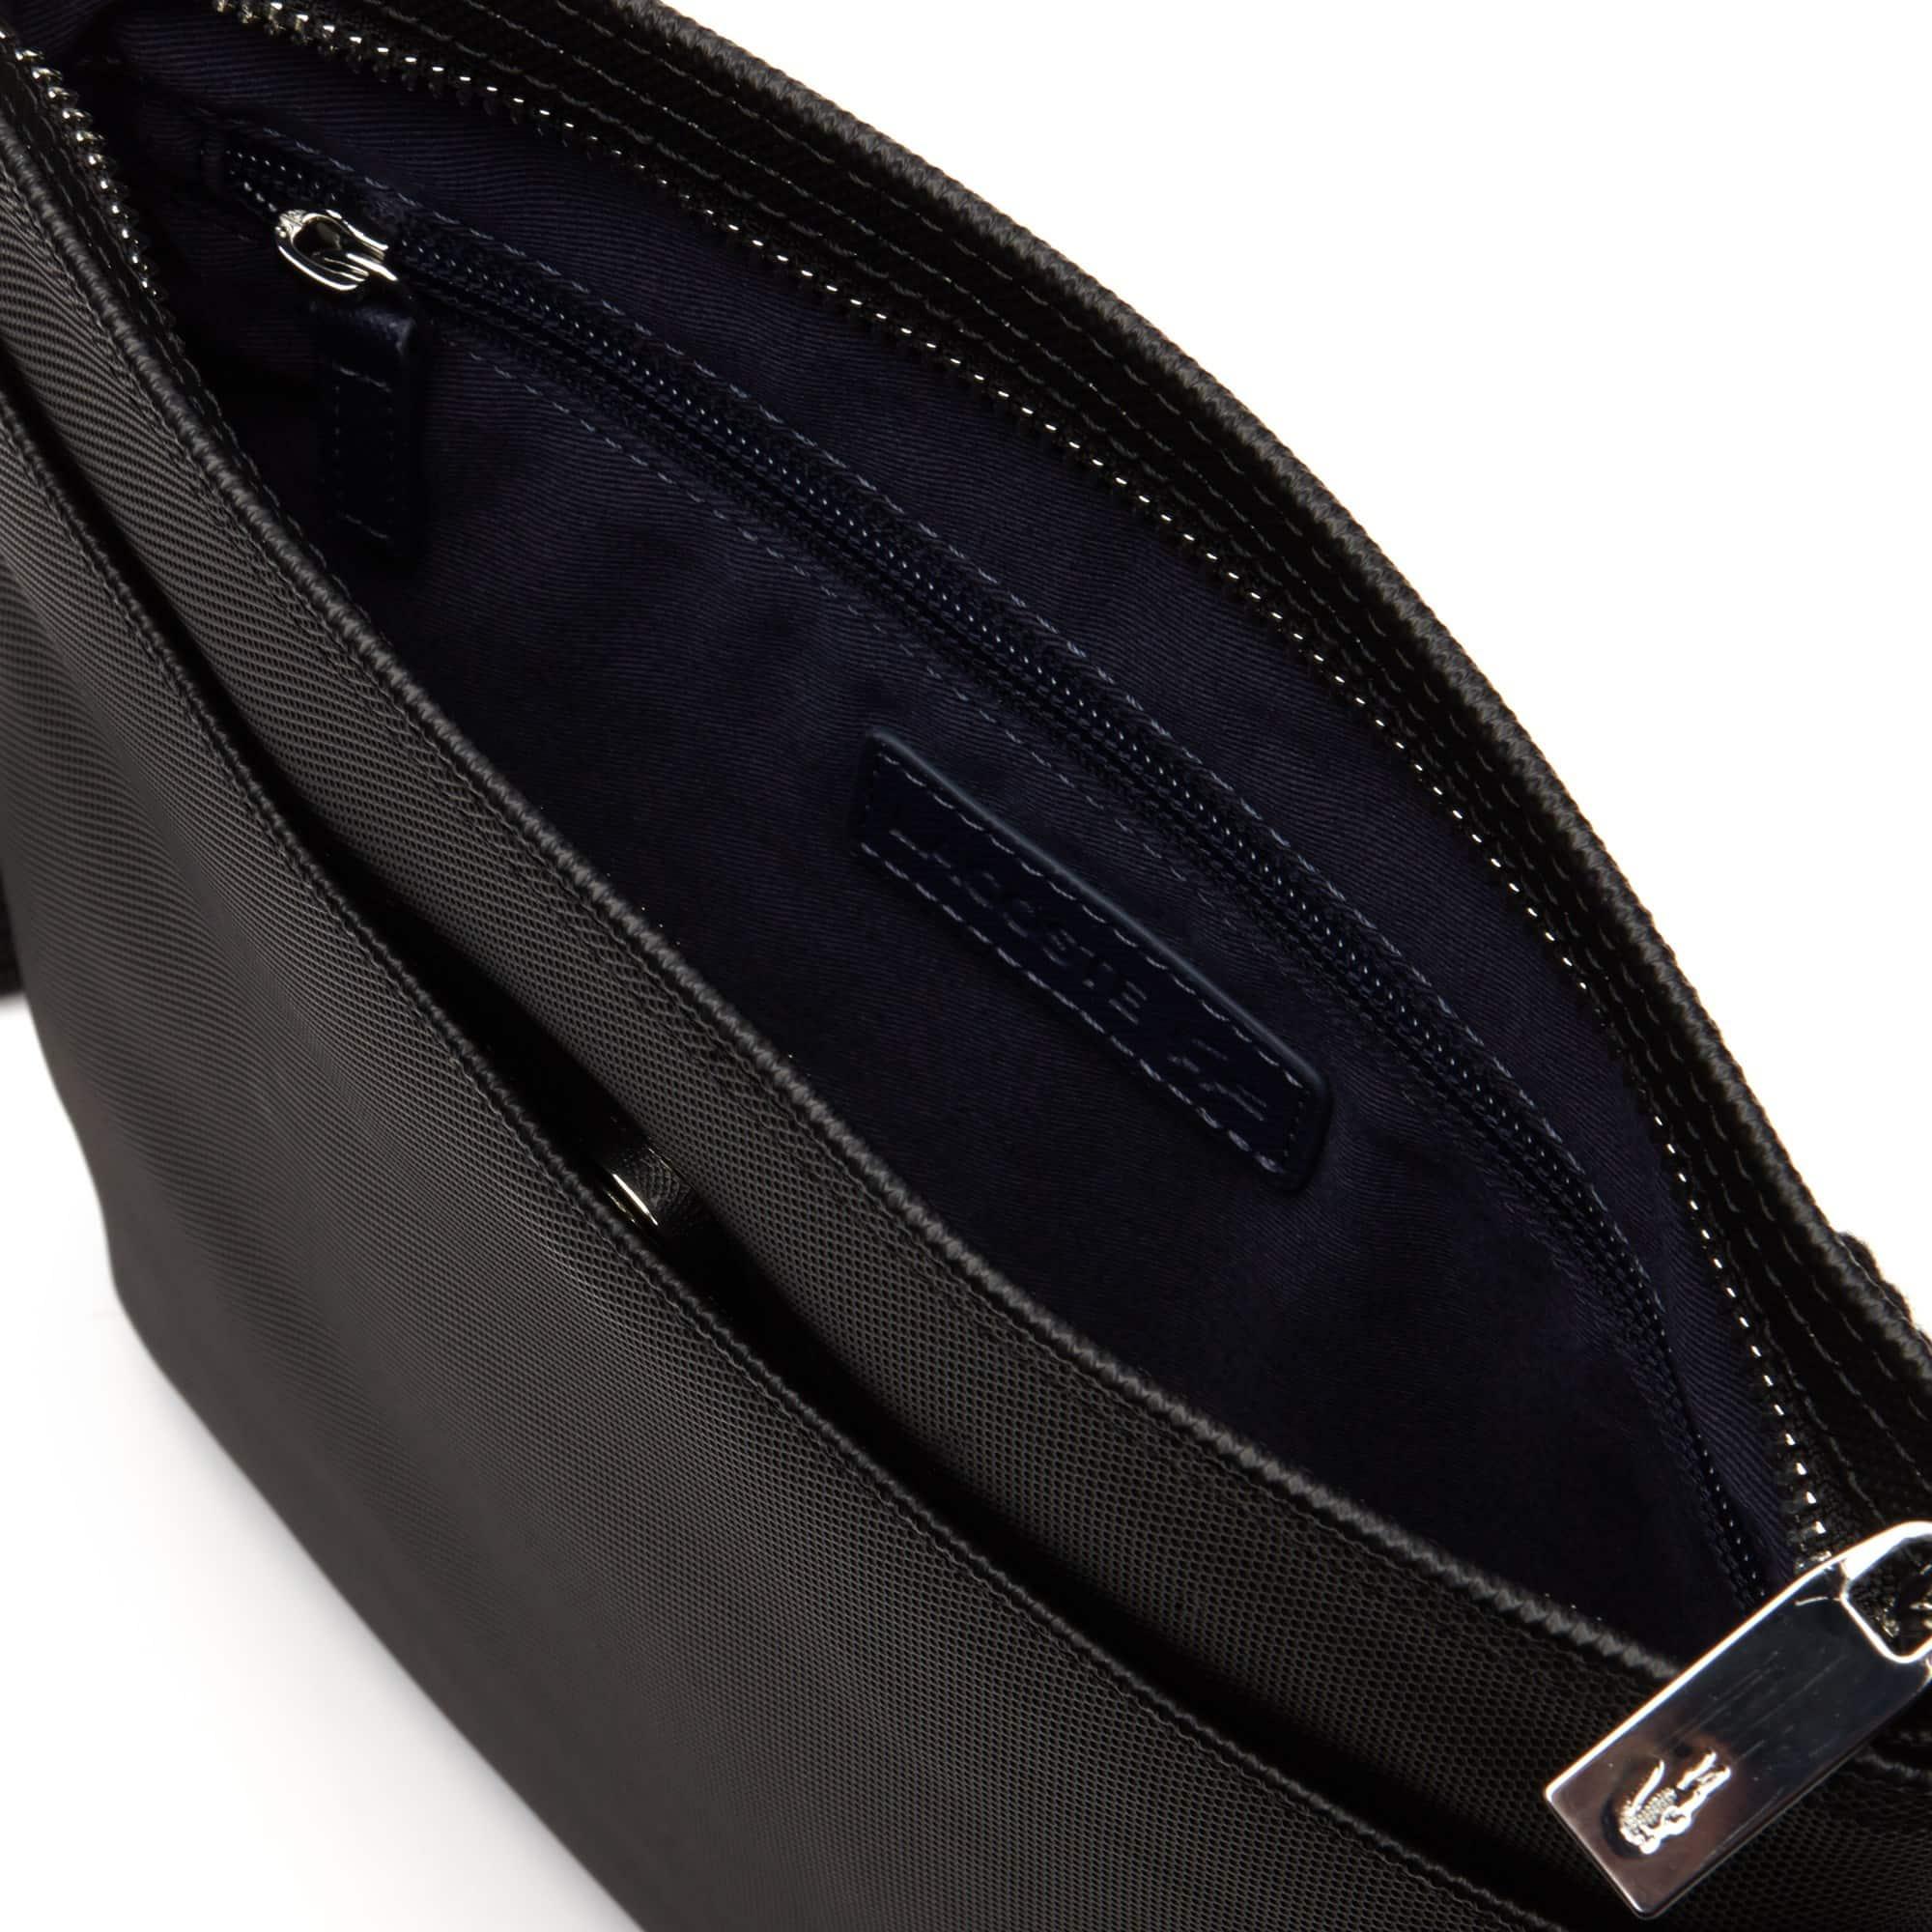 Lacoste - Flache Herren-Tasche CLASSIC aus Petit Piqué - 4